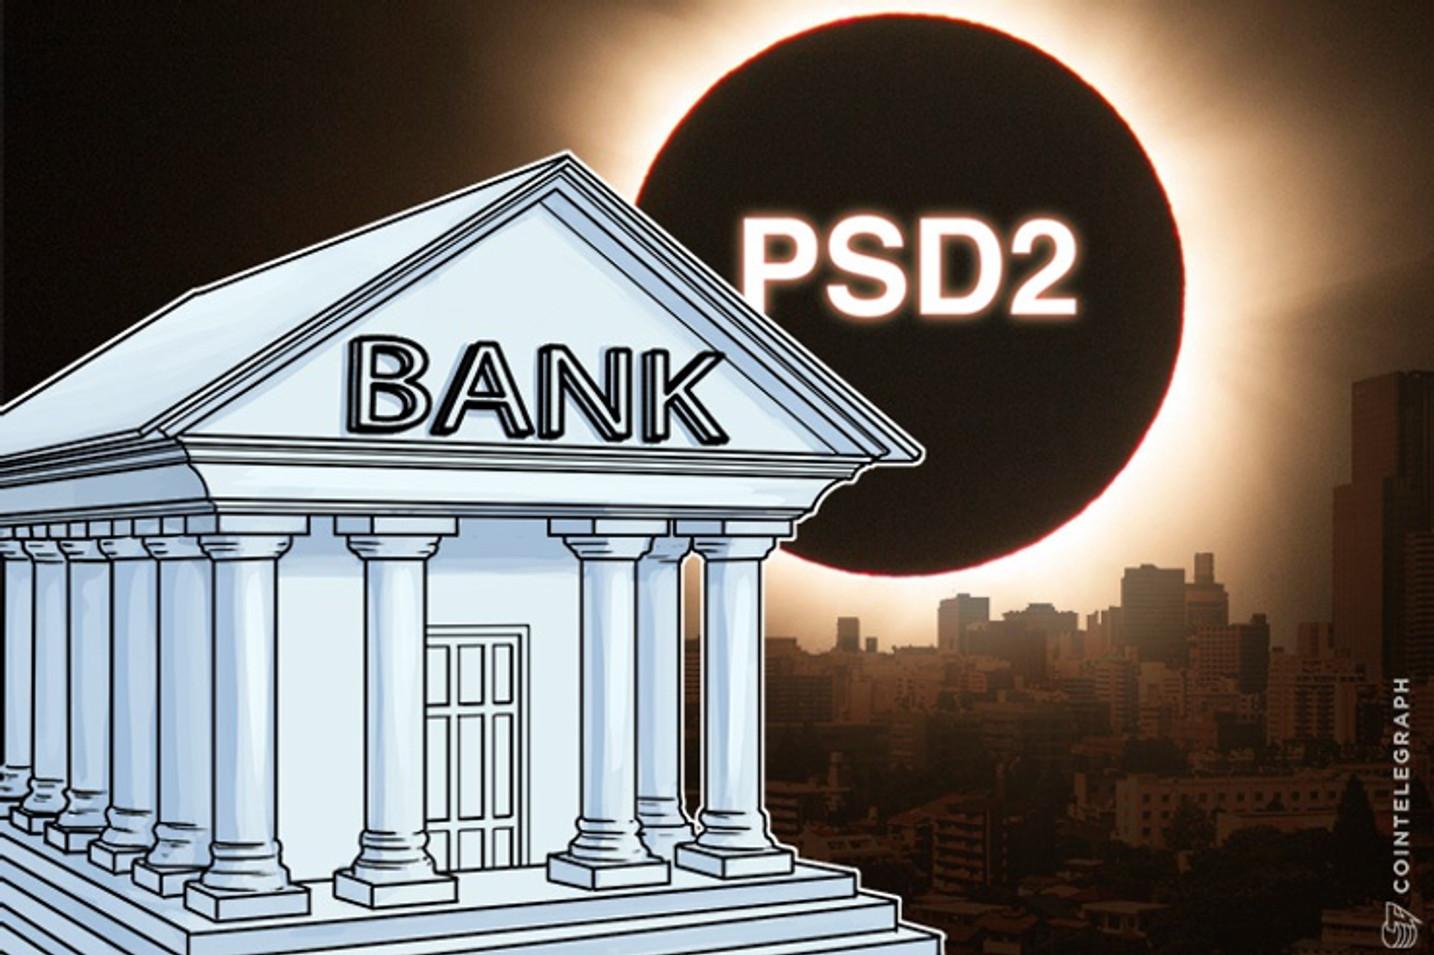 La directiva europea PSD2 que regula servicios de pago entró en vigor en España